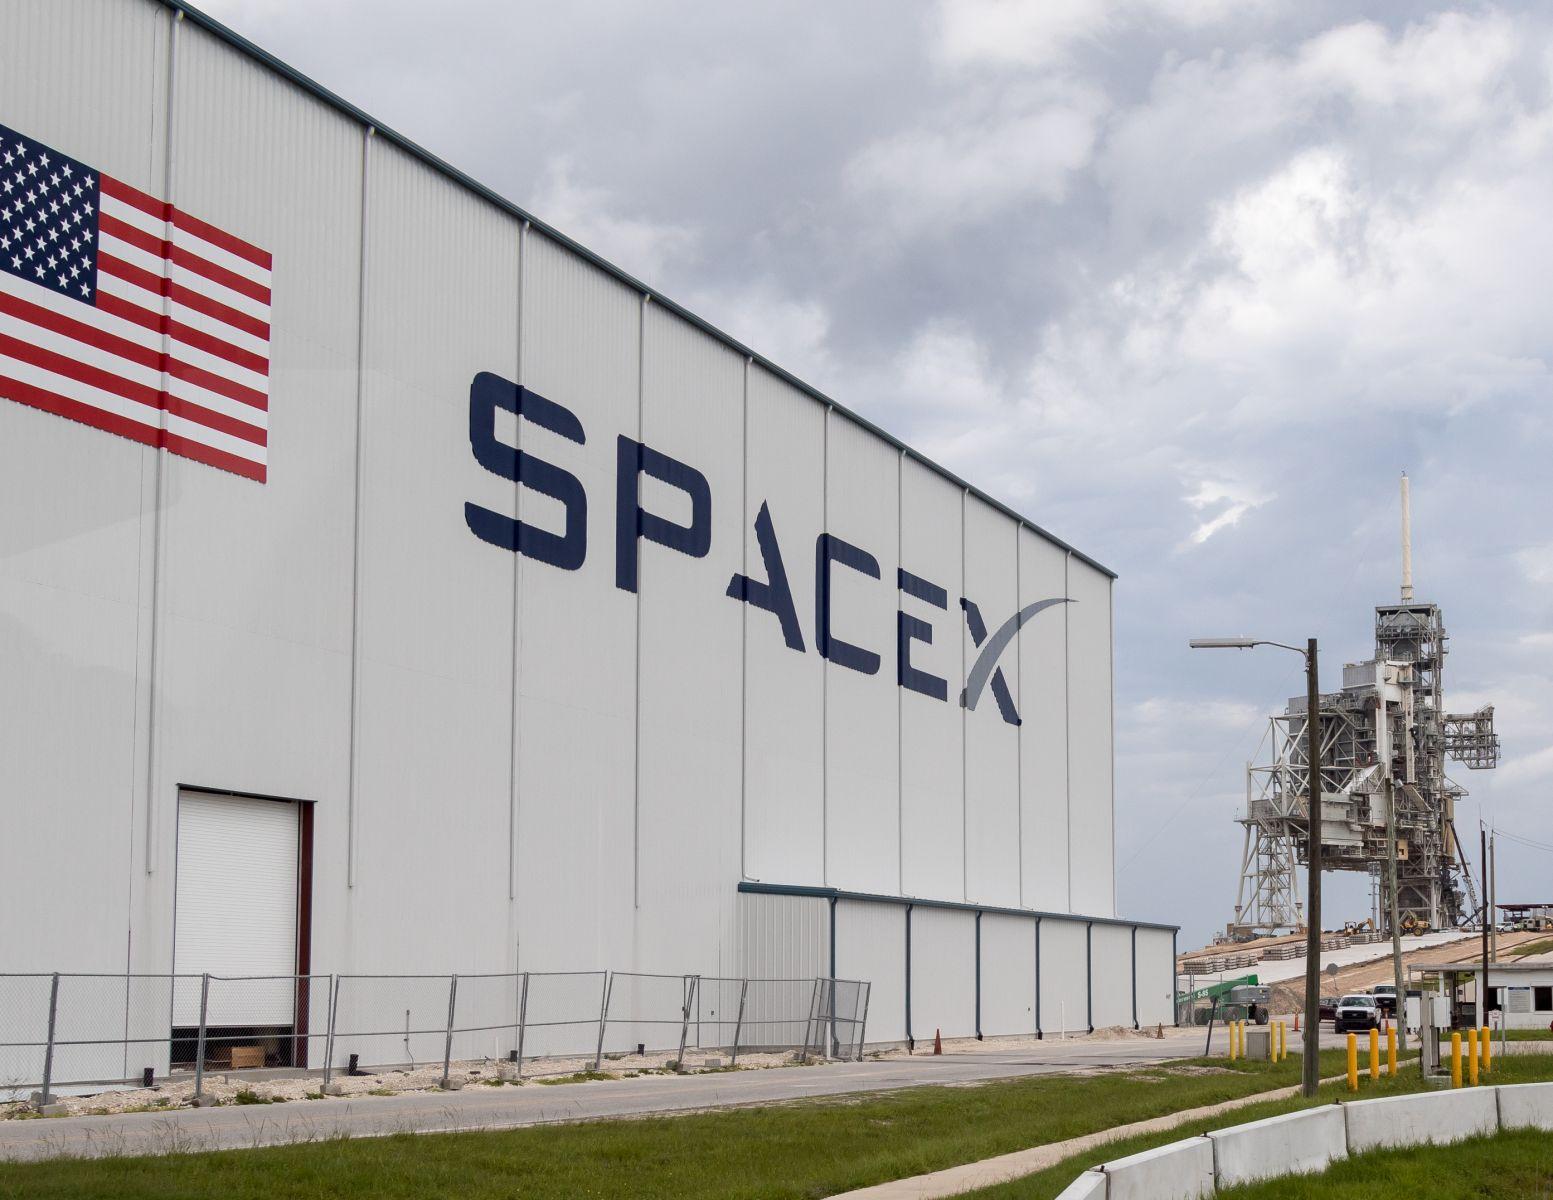 Space X 內部竟有神秘私校招收員工子女,學費全由馬斯克出資!